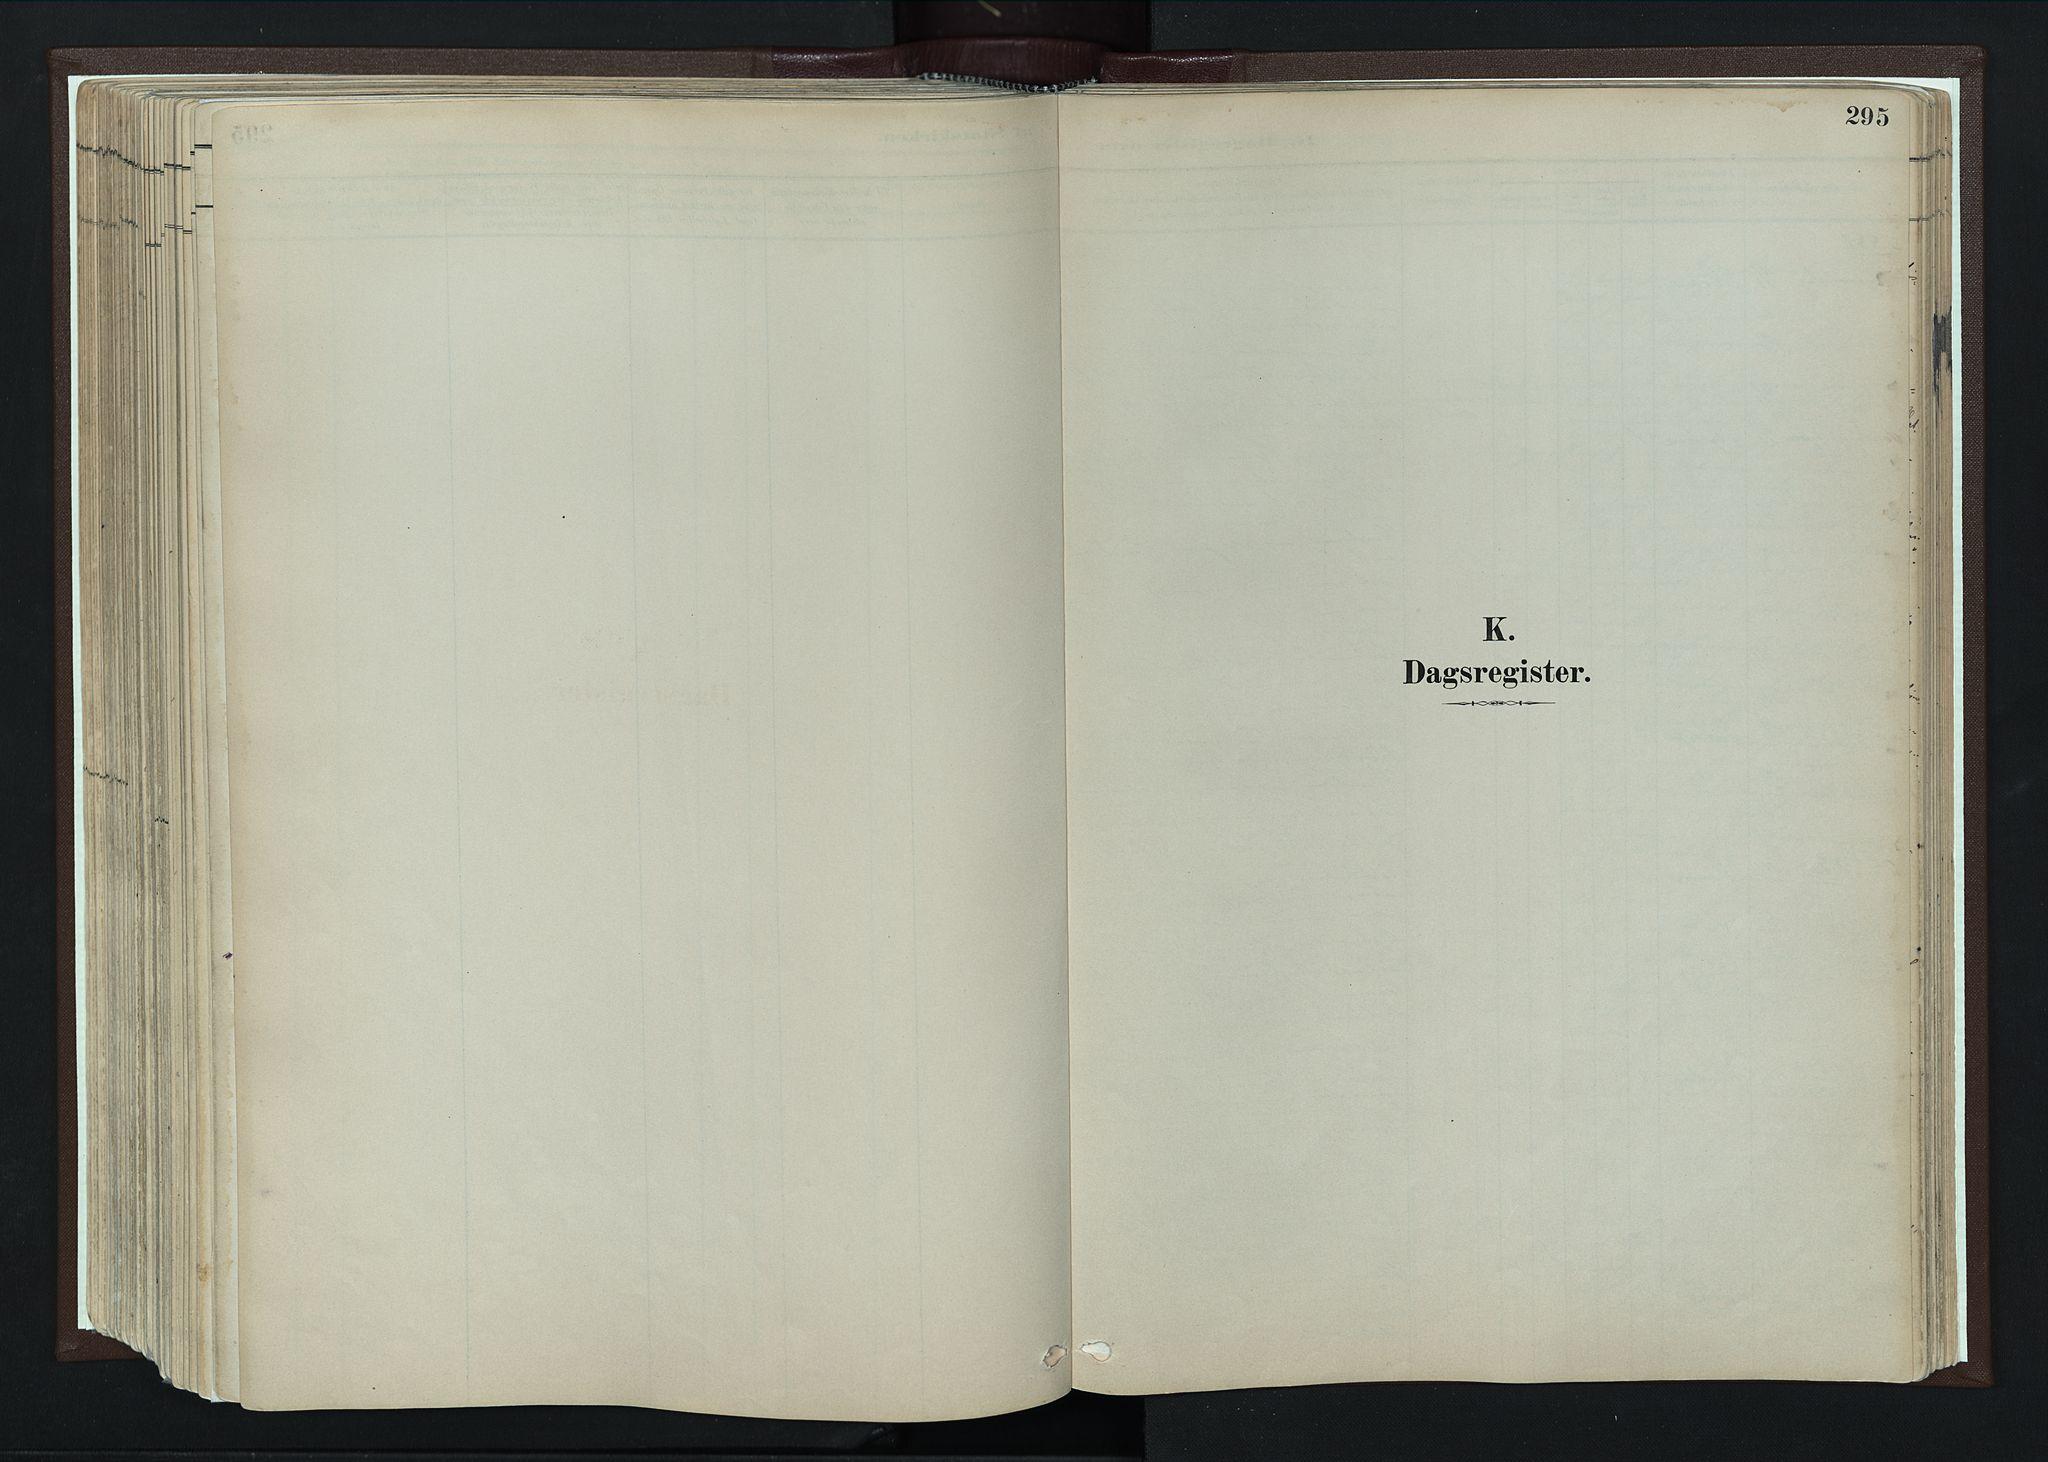 SAH, Nord-Fron prestekontor, Ministerialbok nr. 4, 1884-1914, s. 295